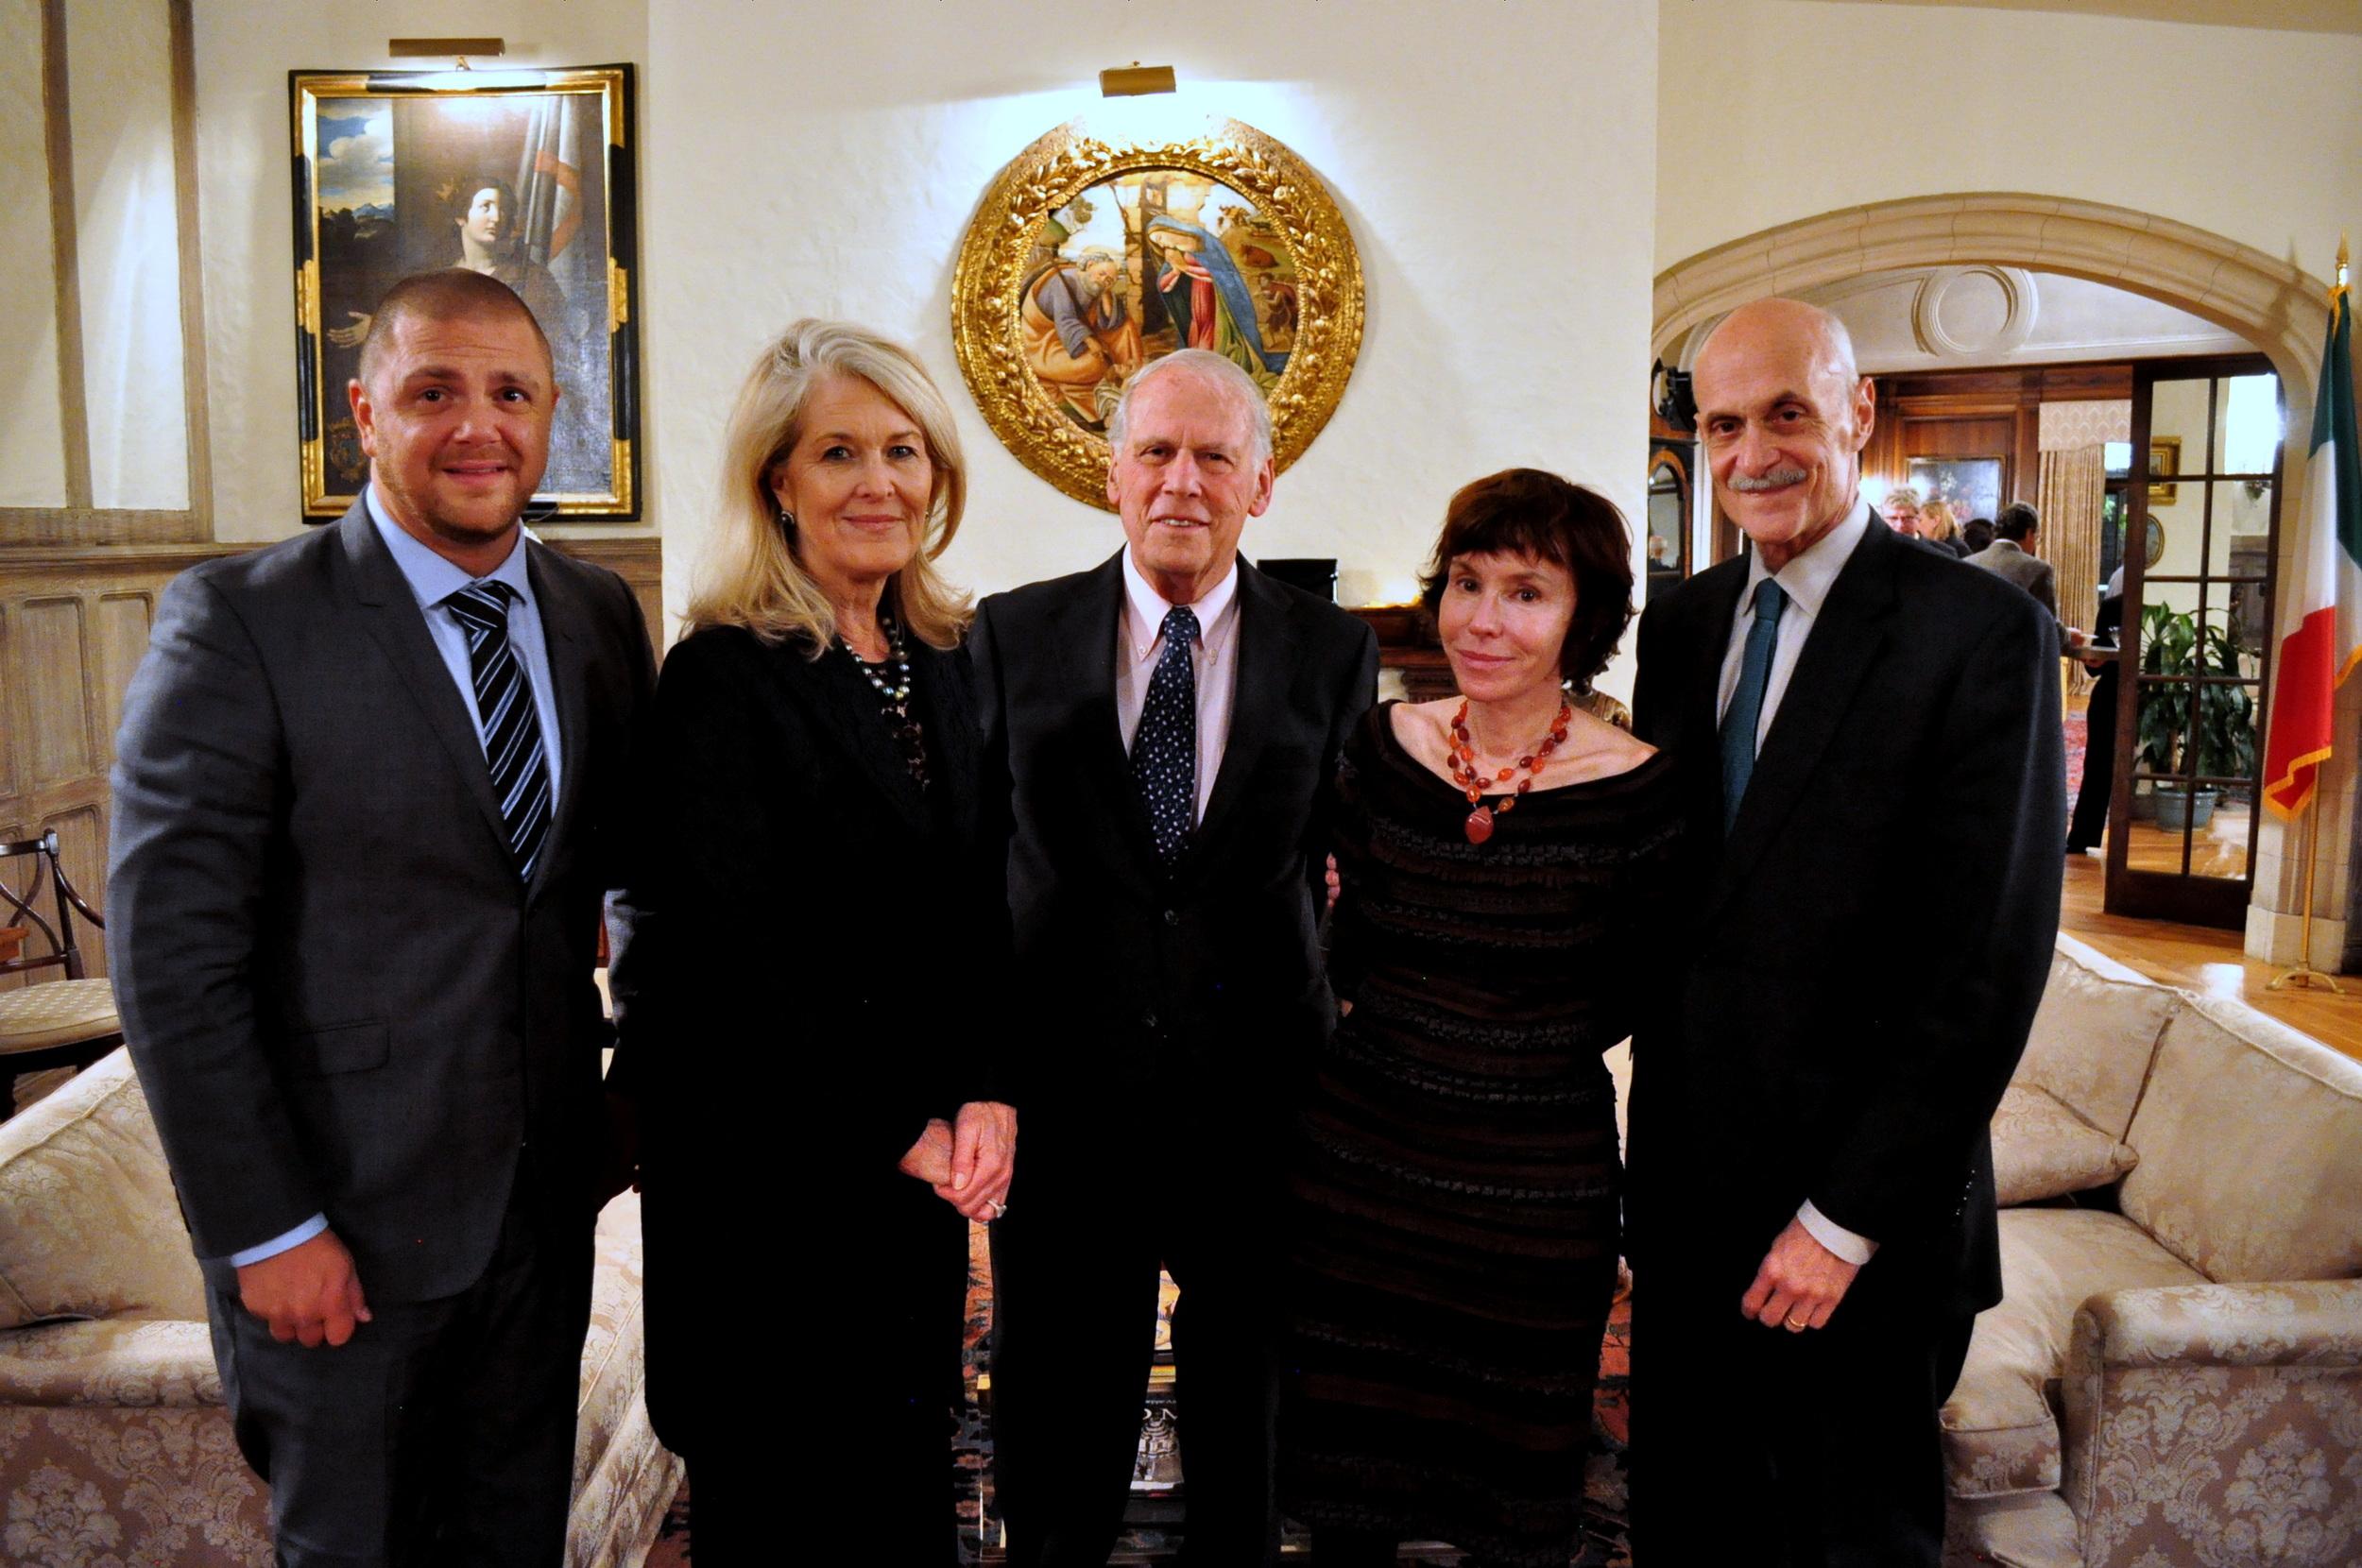 Erik Landemalm, Sydney Johnson, Former U.S. Ambassador Walter Cutler, Meryl Chertoff, and former Secretary of Homeland Security Michael Chertoff.